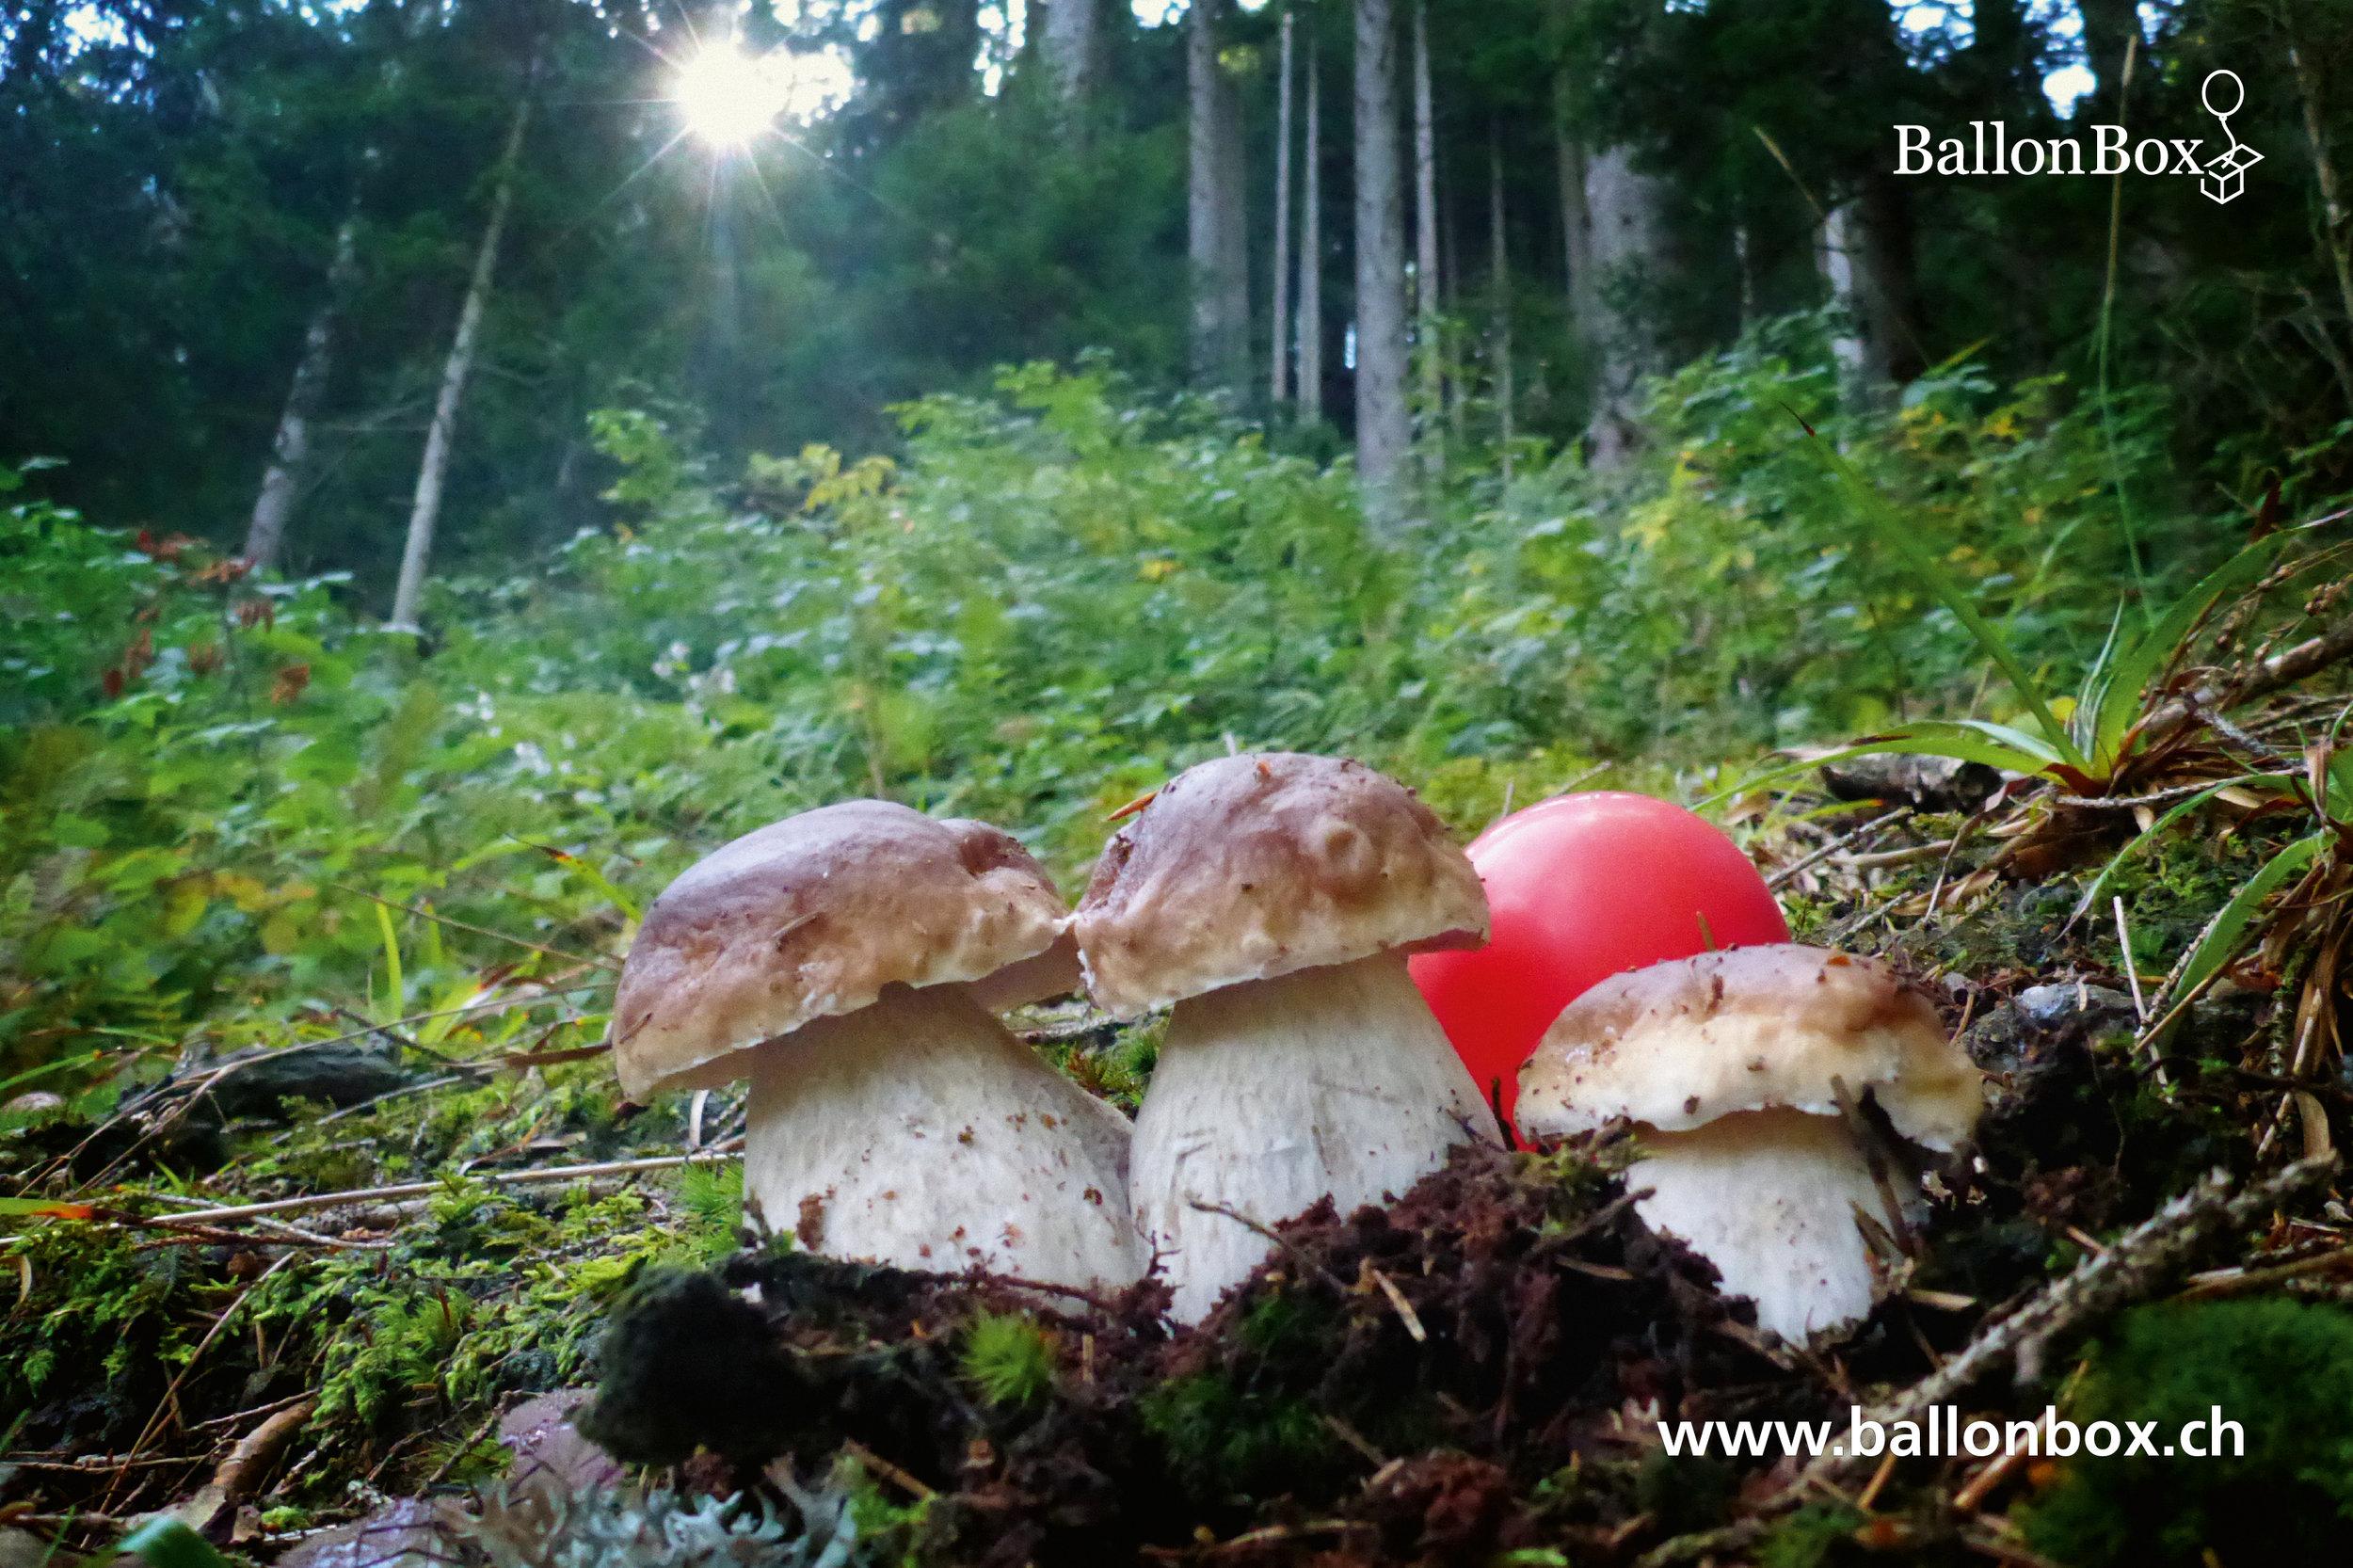 BallonBox_Kalender_19-09.jpg